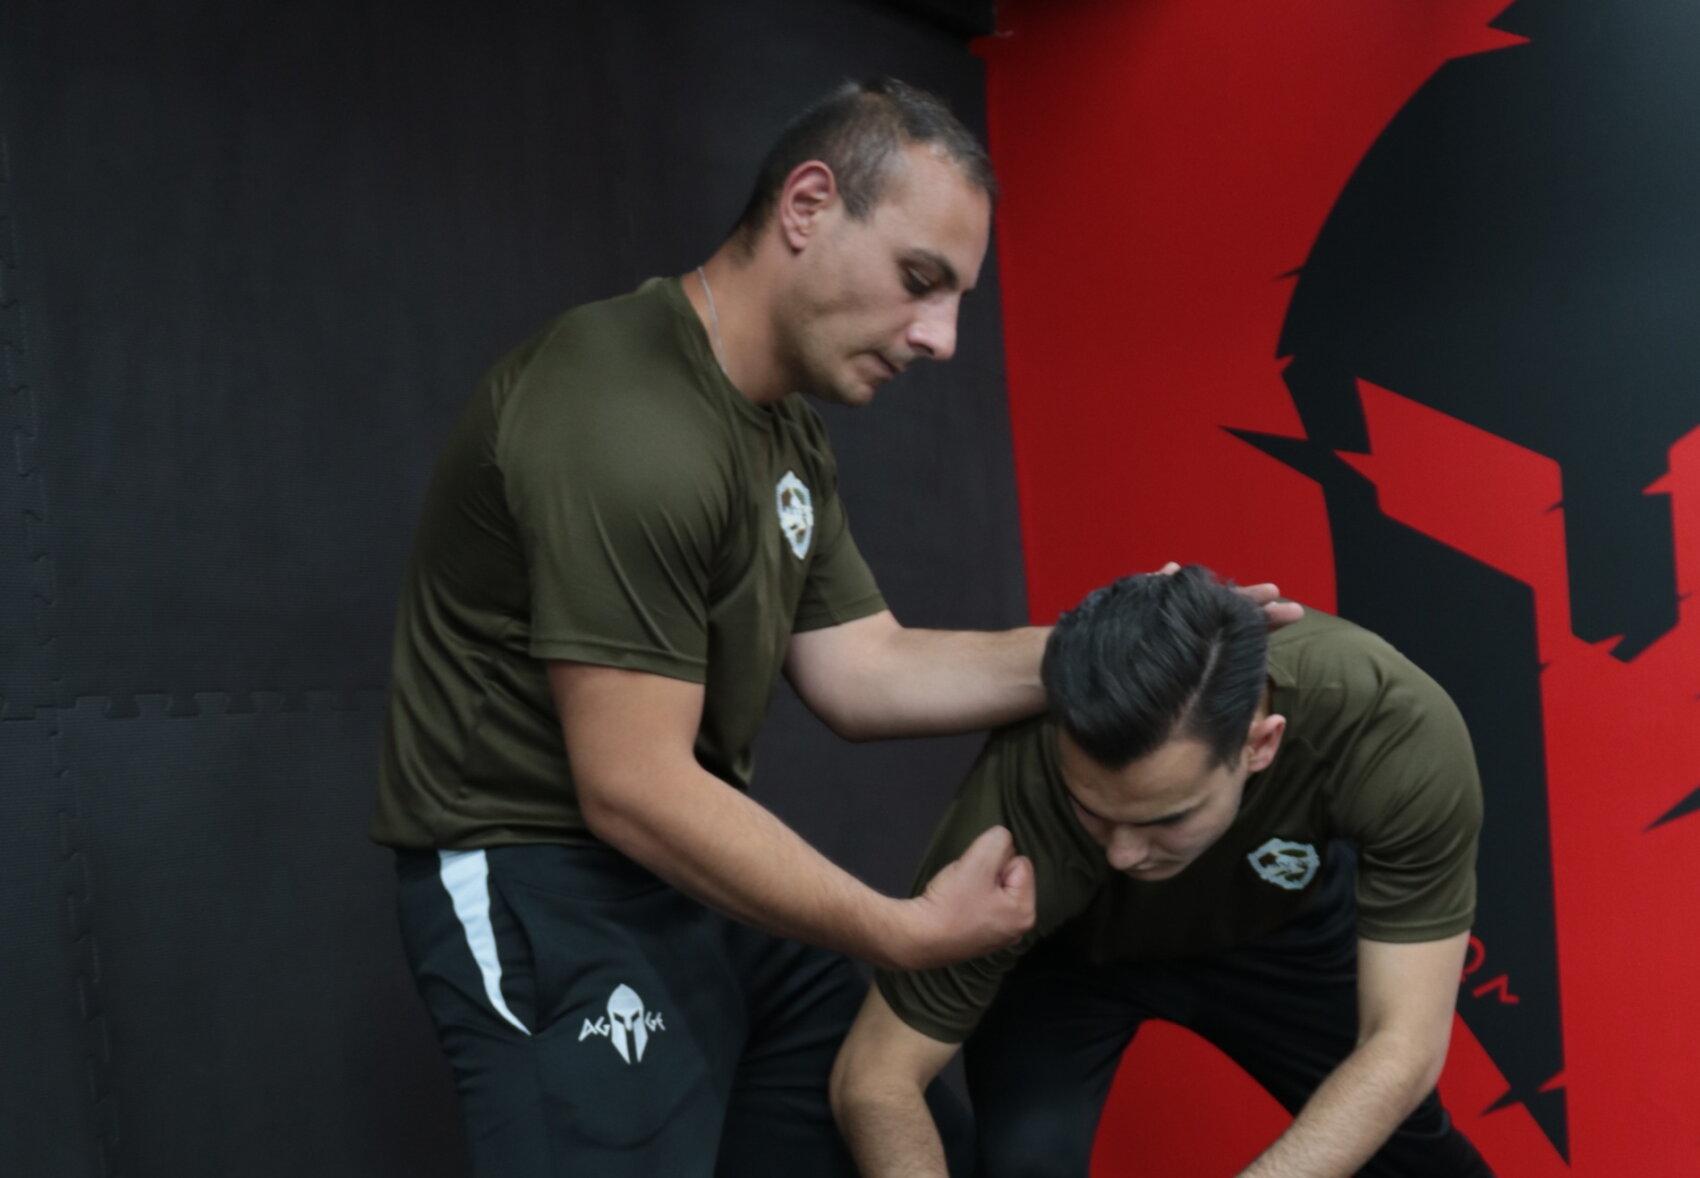 Waiblingen KravMaga MMA Kampfsport Wing Tsun